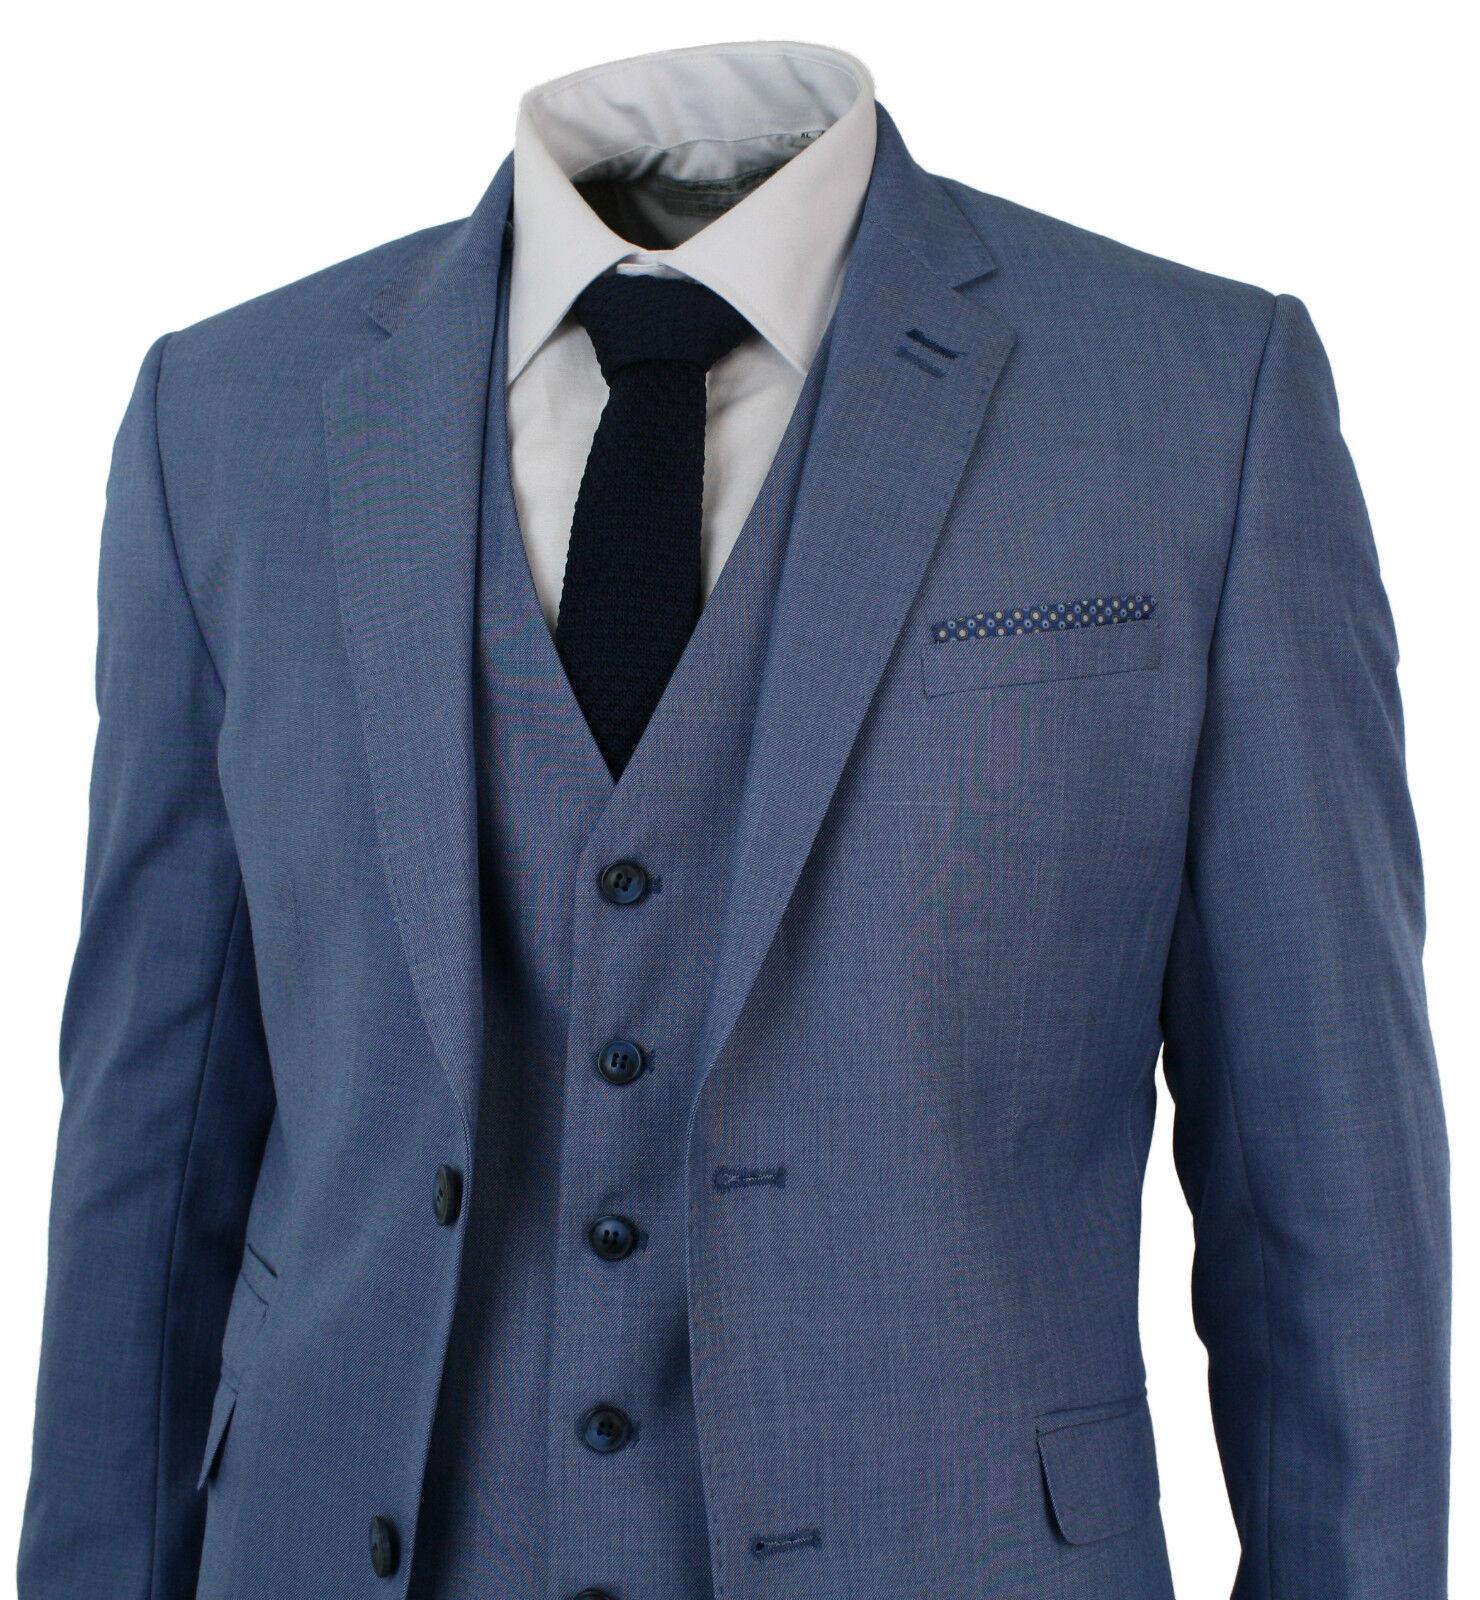 Herren Light Sky Blau 3 Piece Smart Formal Wedding Party Suit TailoROT Fit